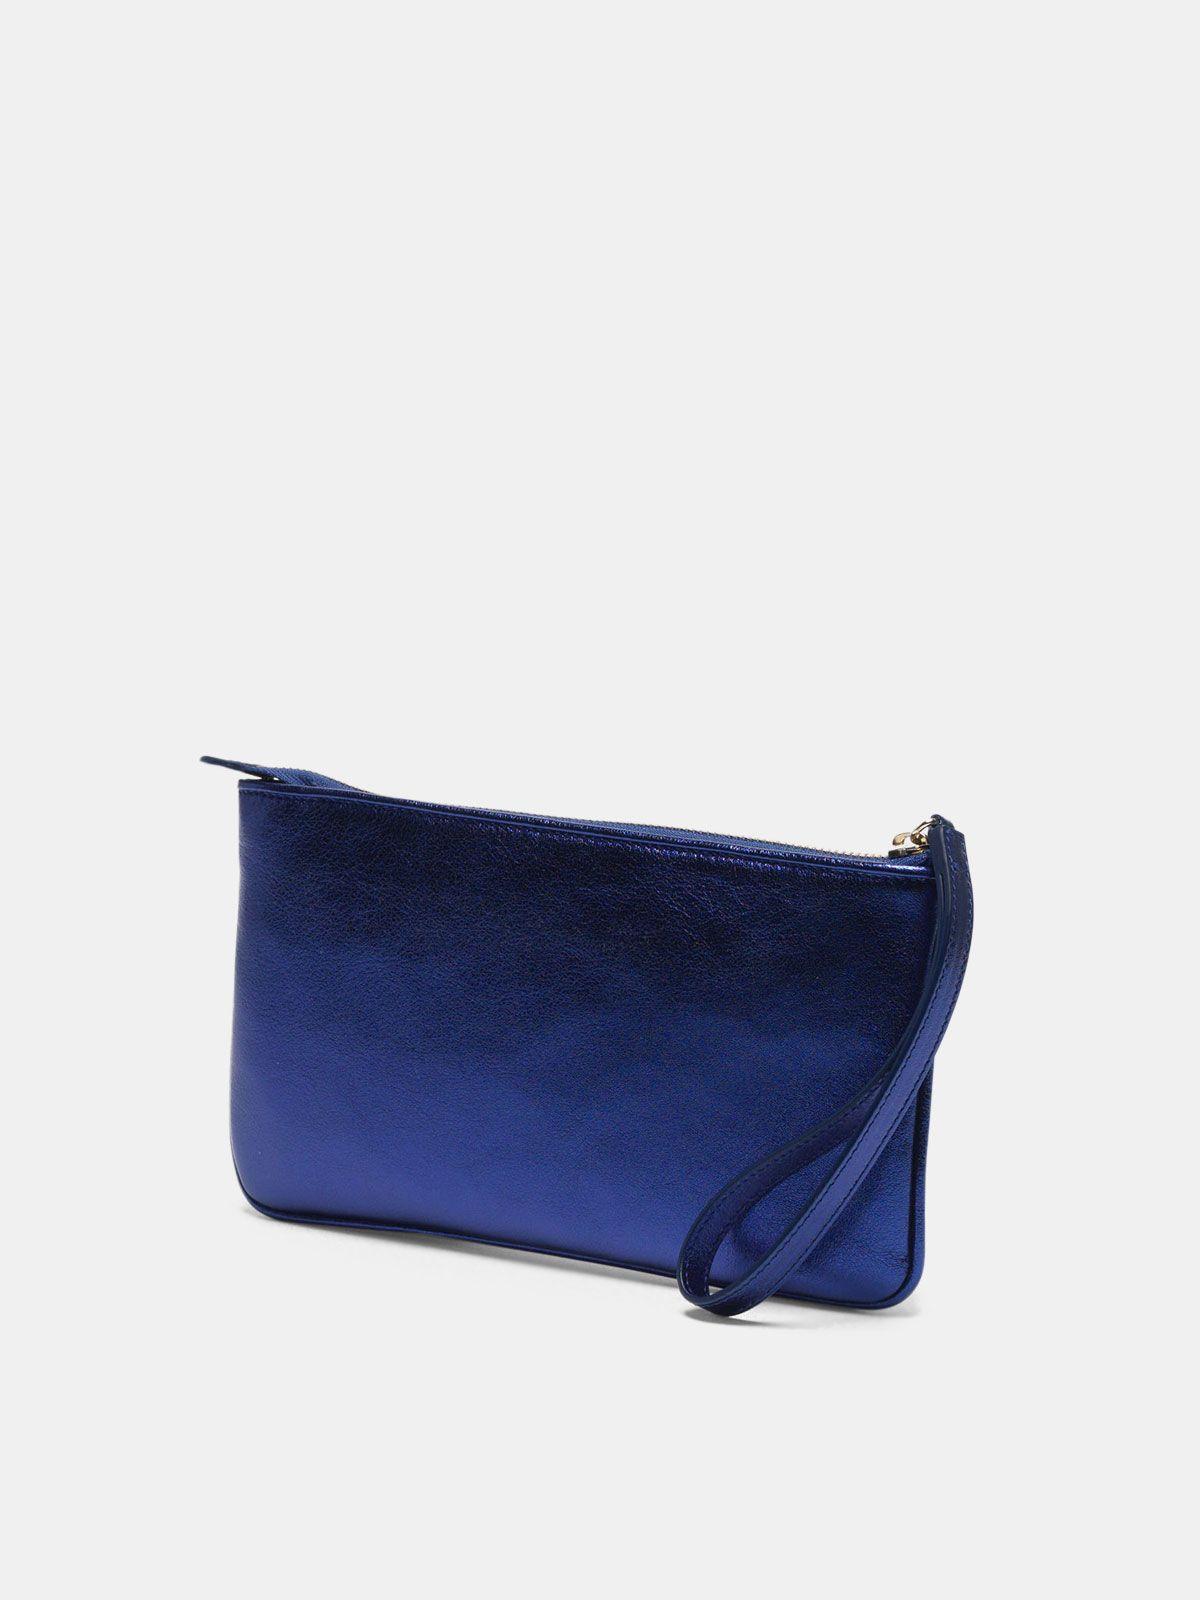 Golden Goose - Metallic blue Star Wrist clutch bag   in